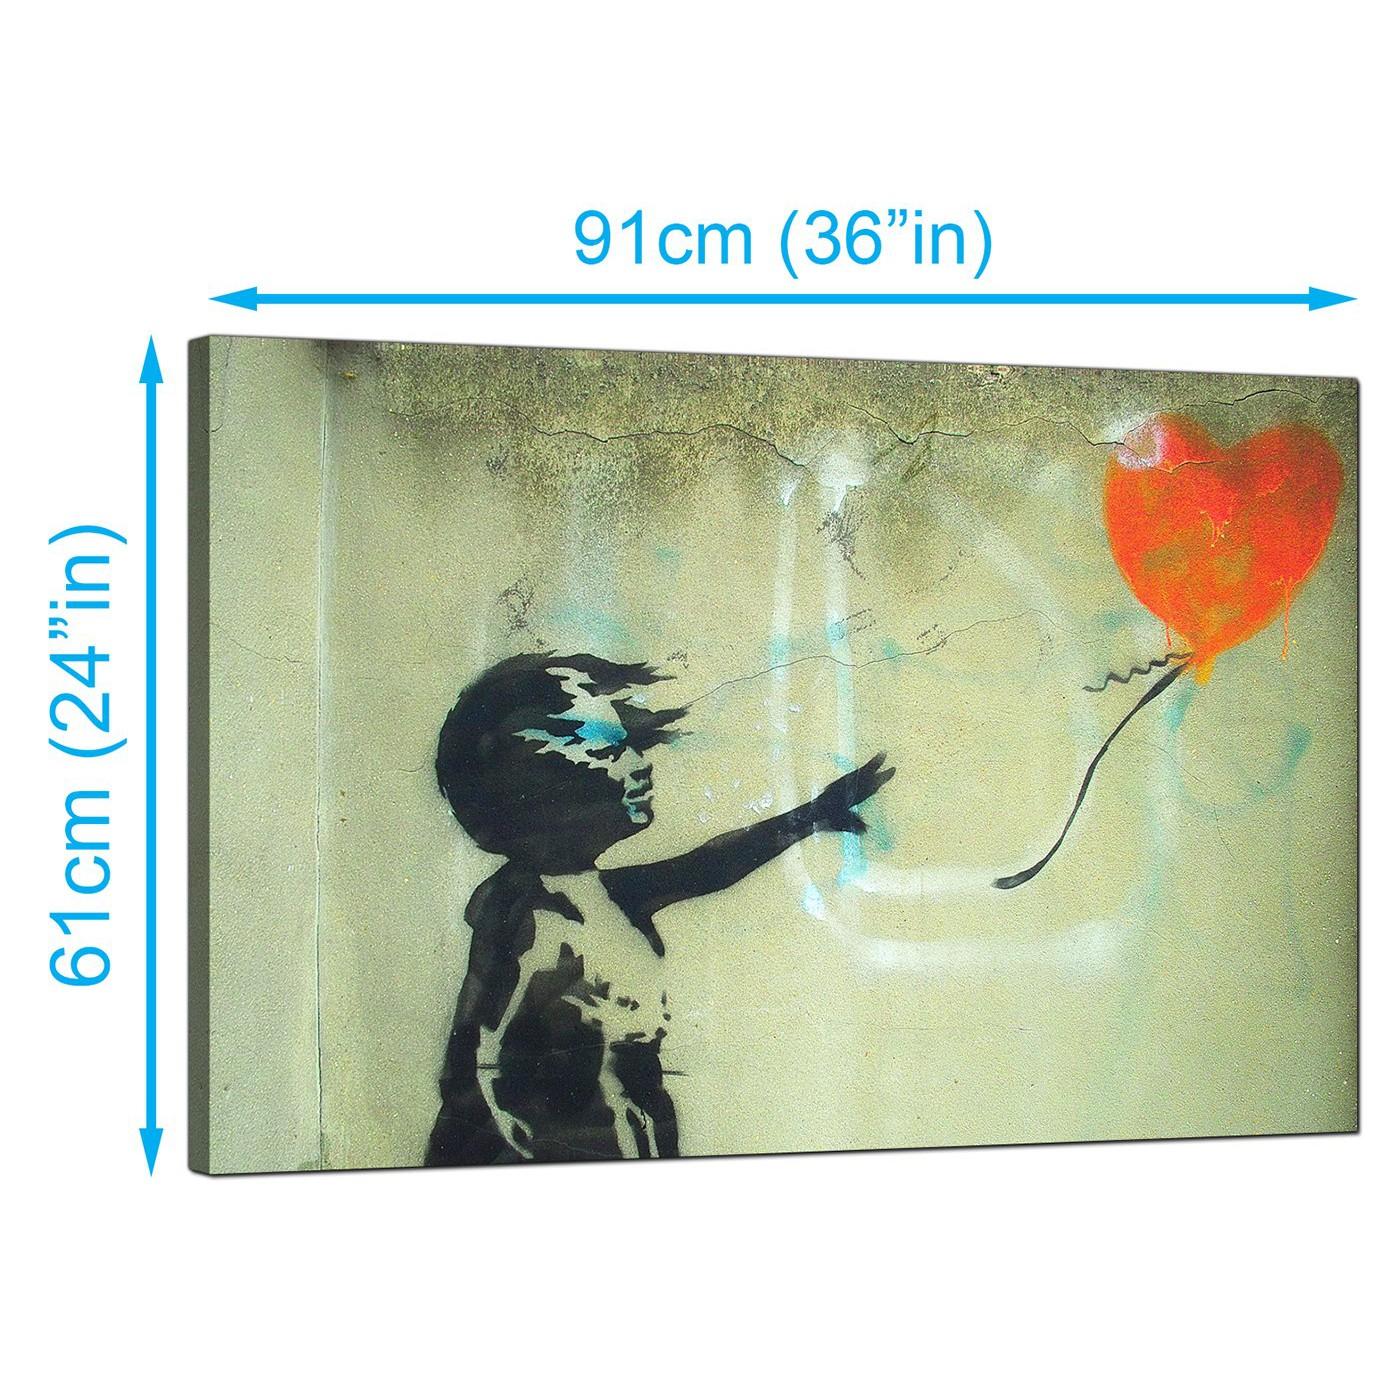 Display gallery item 3 · banksy canvas prints uk girl child and a heart balloon graffiti art display gallery item 4